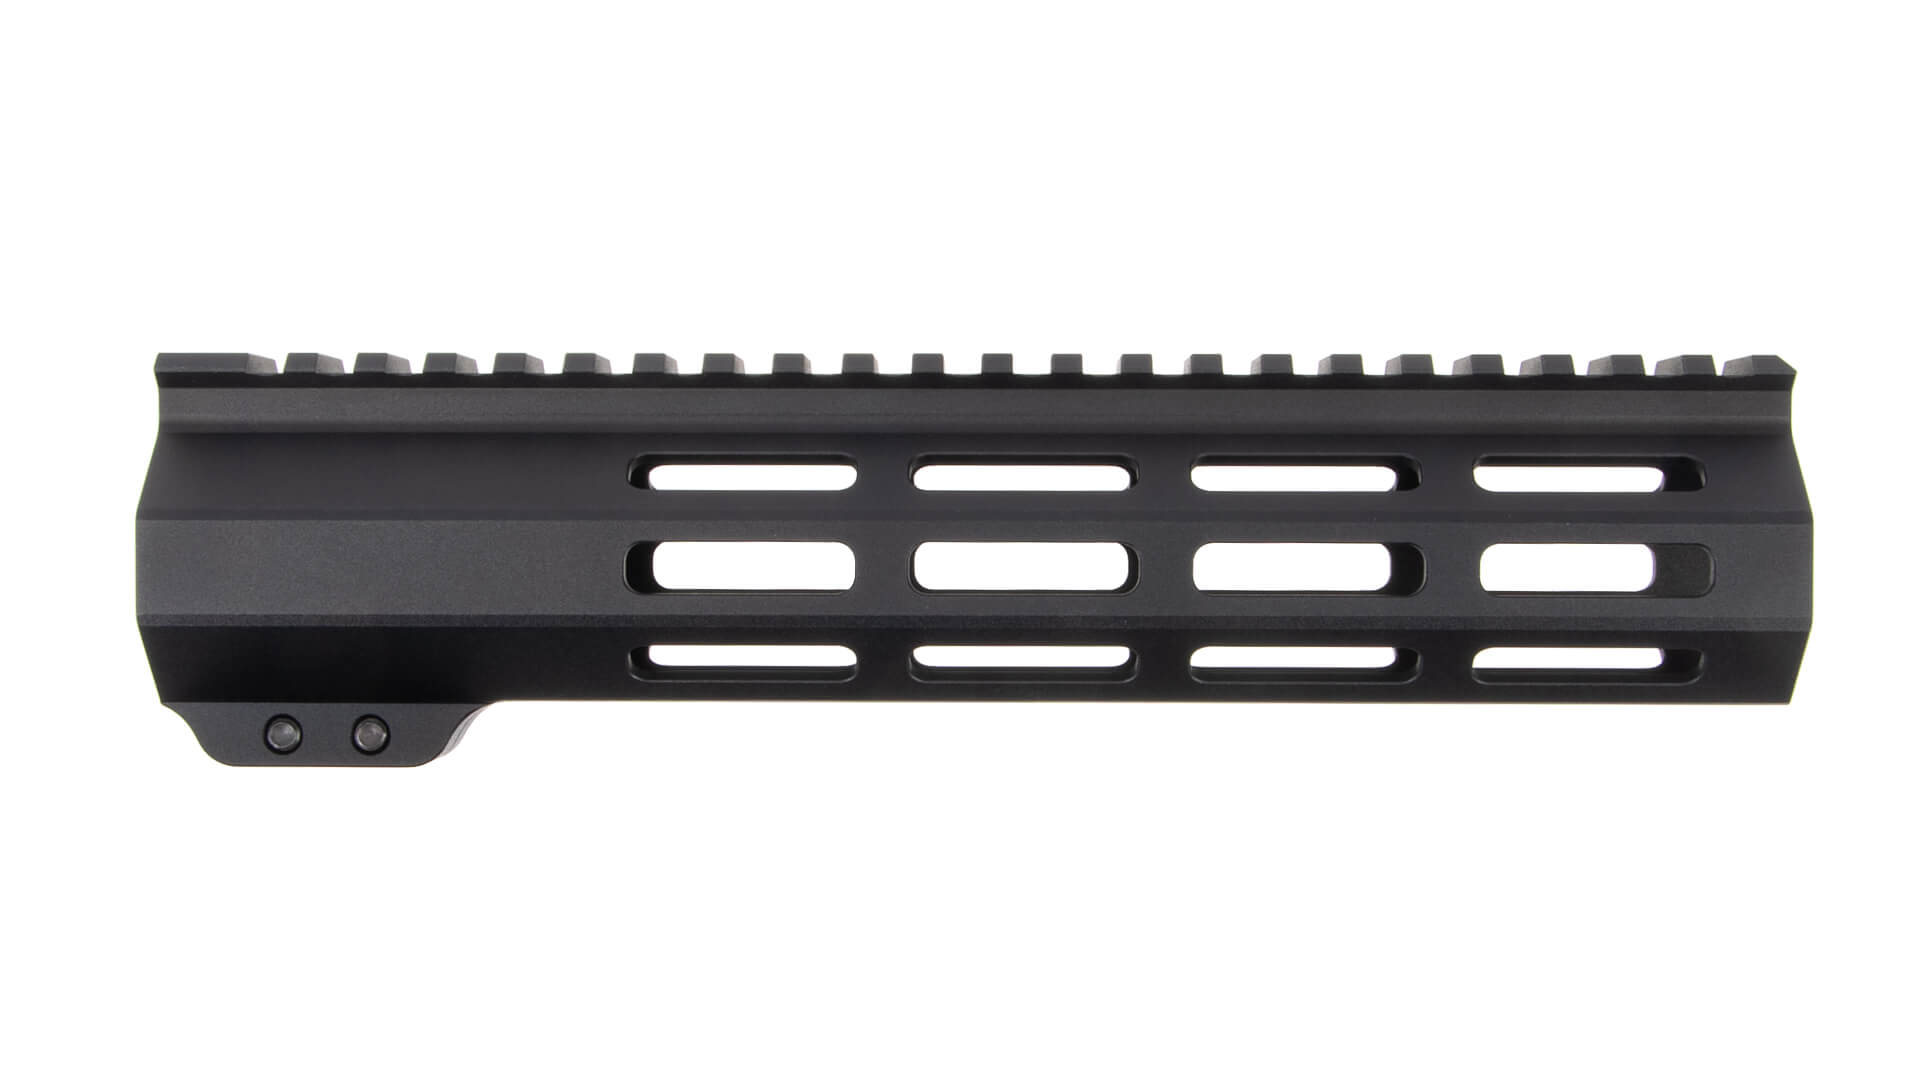 arms republic m-lok mlok rs handguard ar-15 ar15 9.25 rail